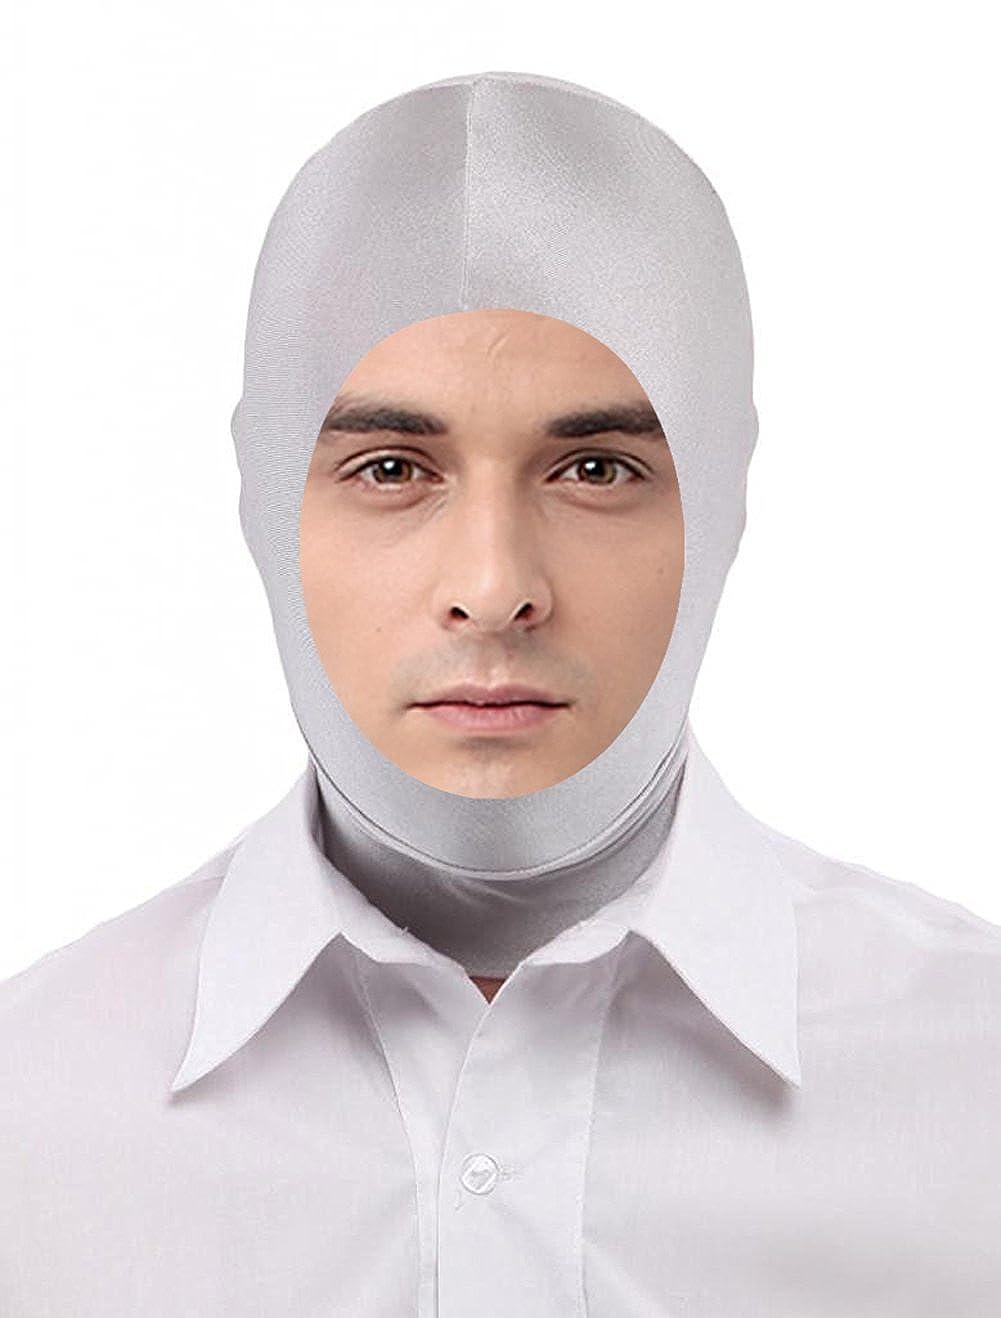 Seeksmile Unisex Lycra Spandex Zentai Hood Mask